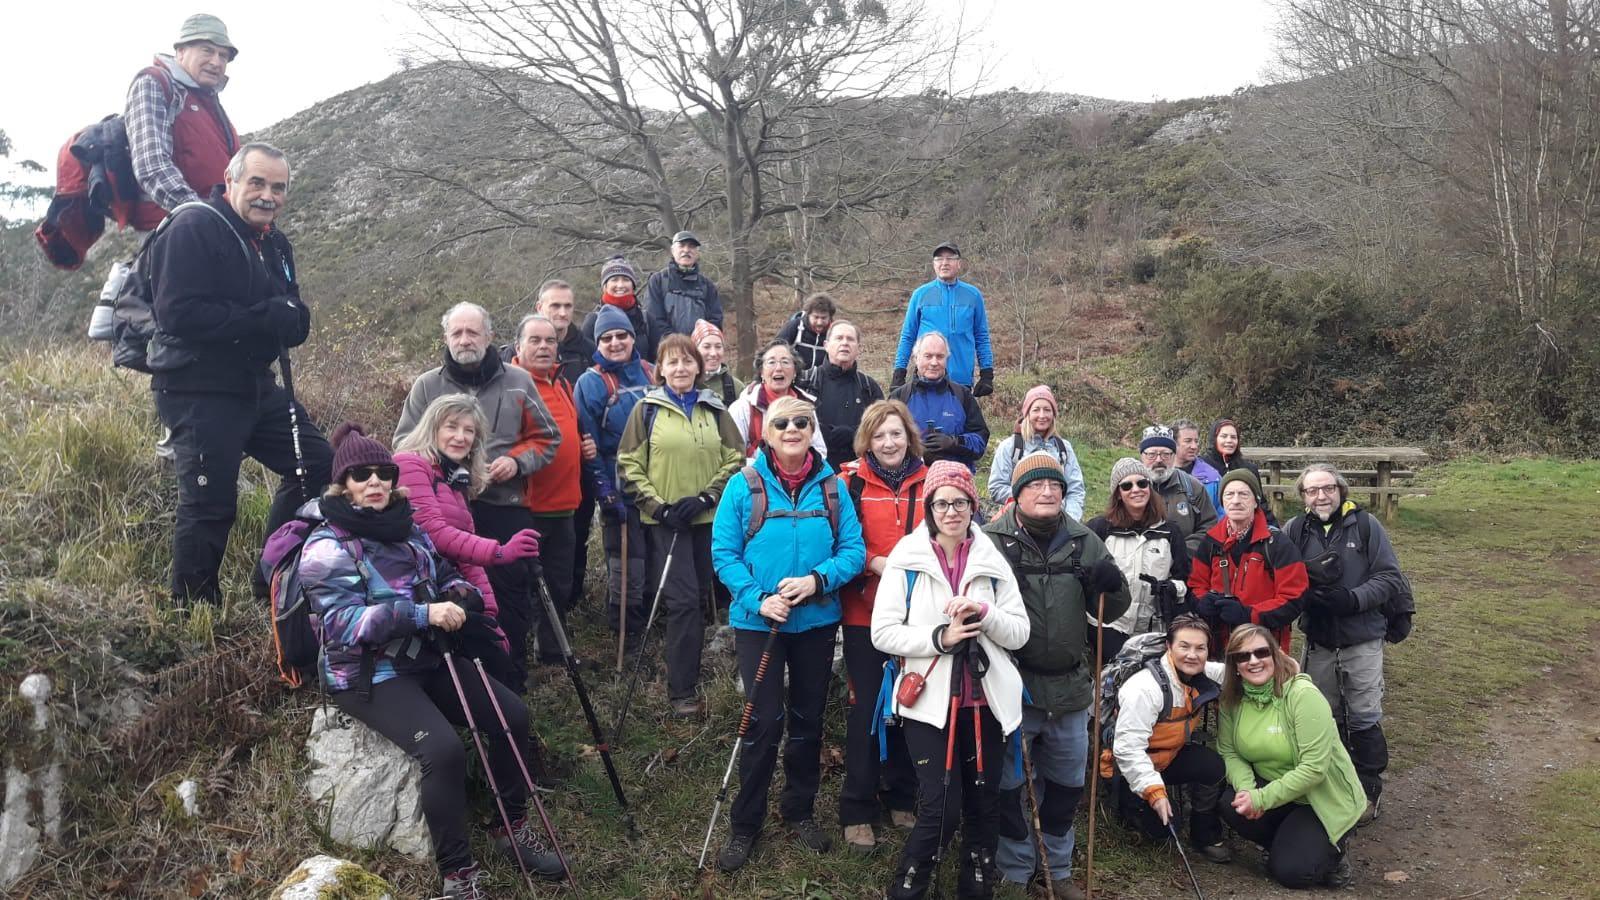 13 enero, 2019: Oviedo - Covadonga, 1ª etapa (Oviedo - Bendición) (Foto grupo)